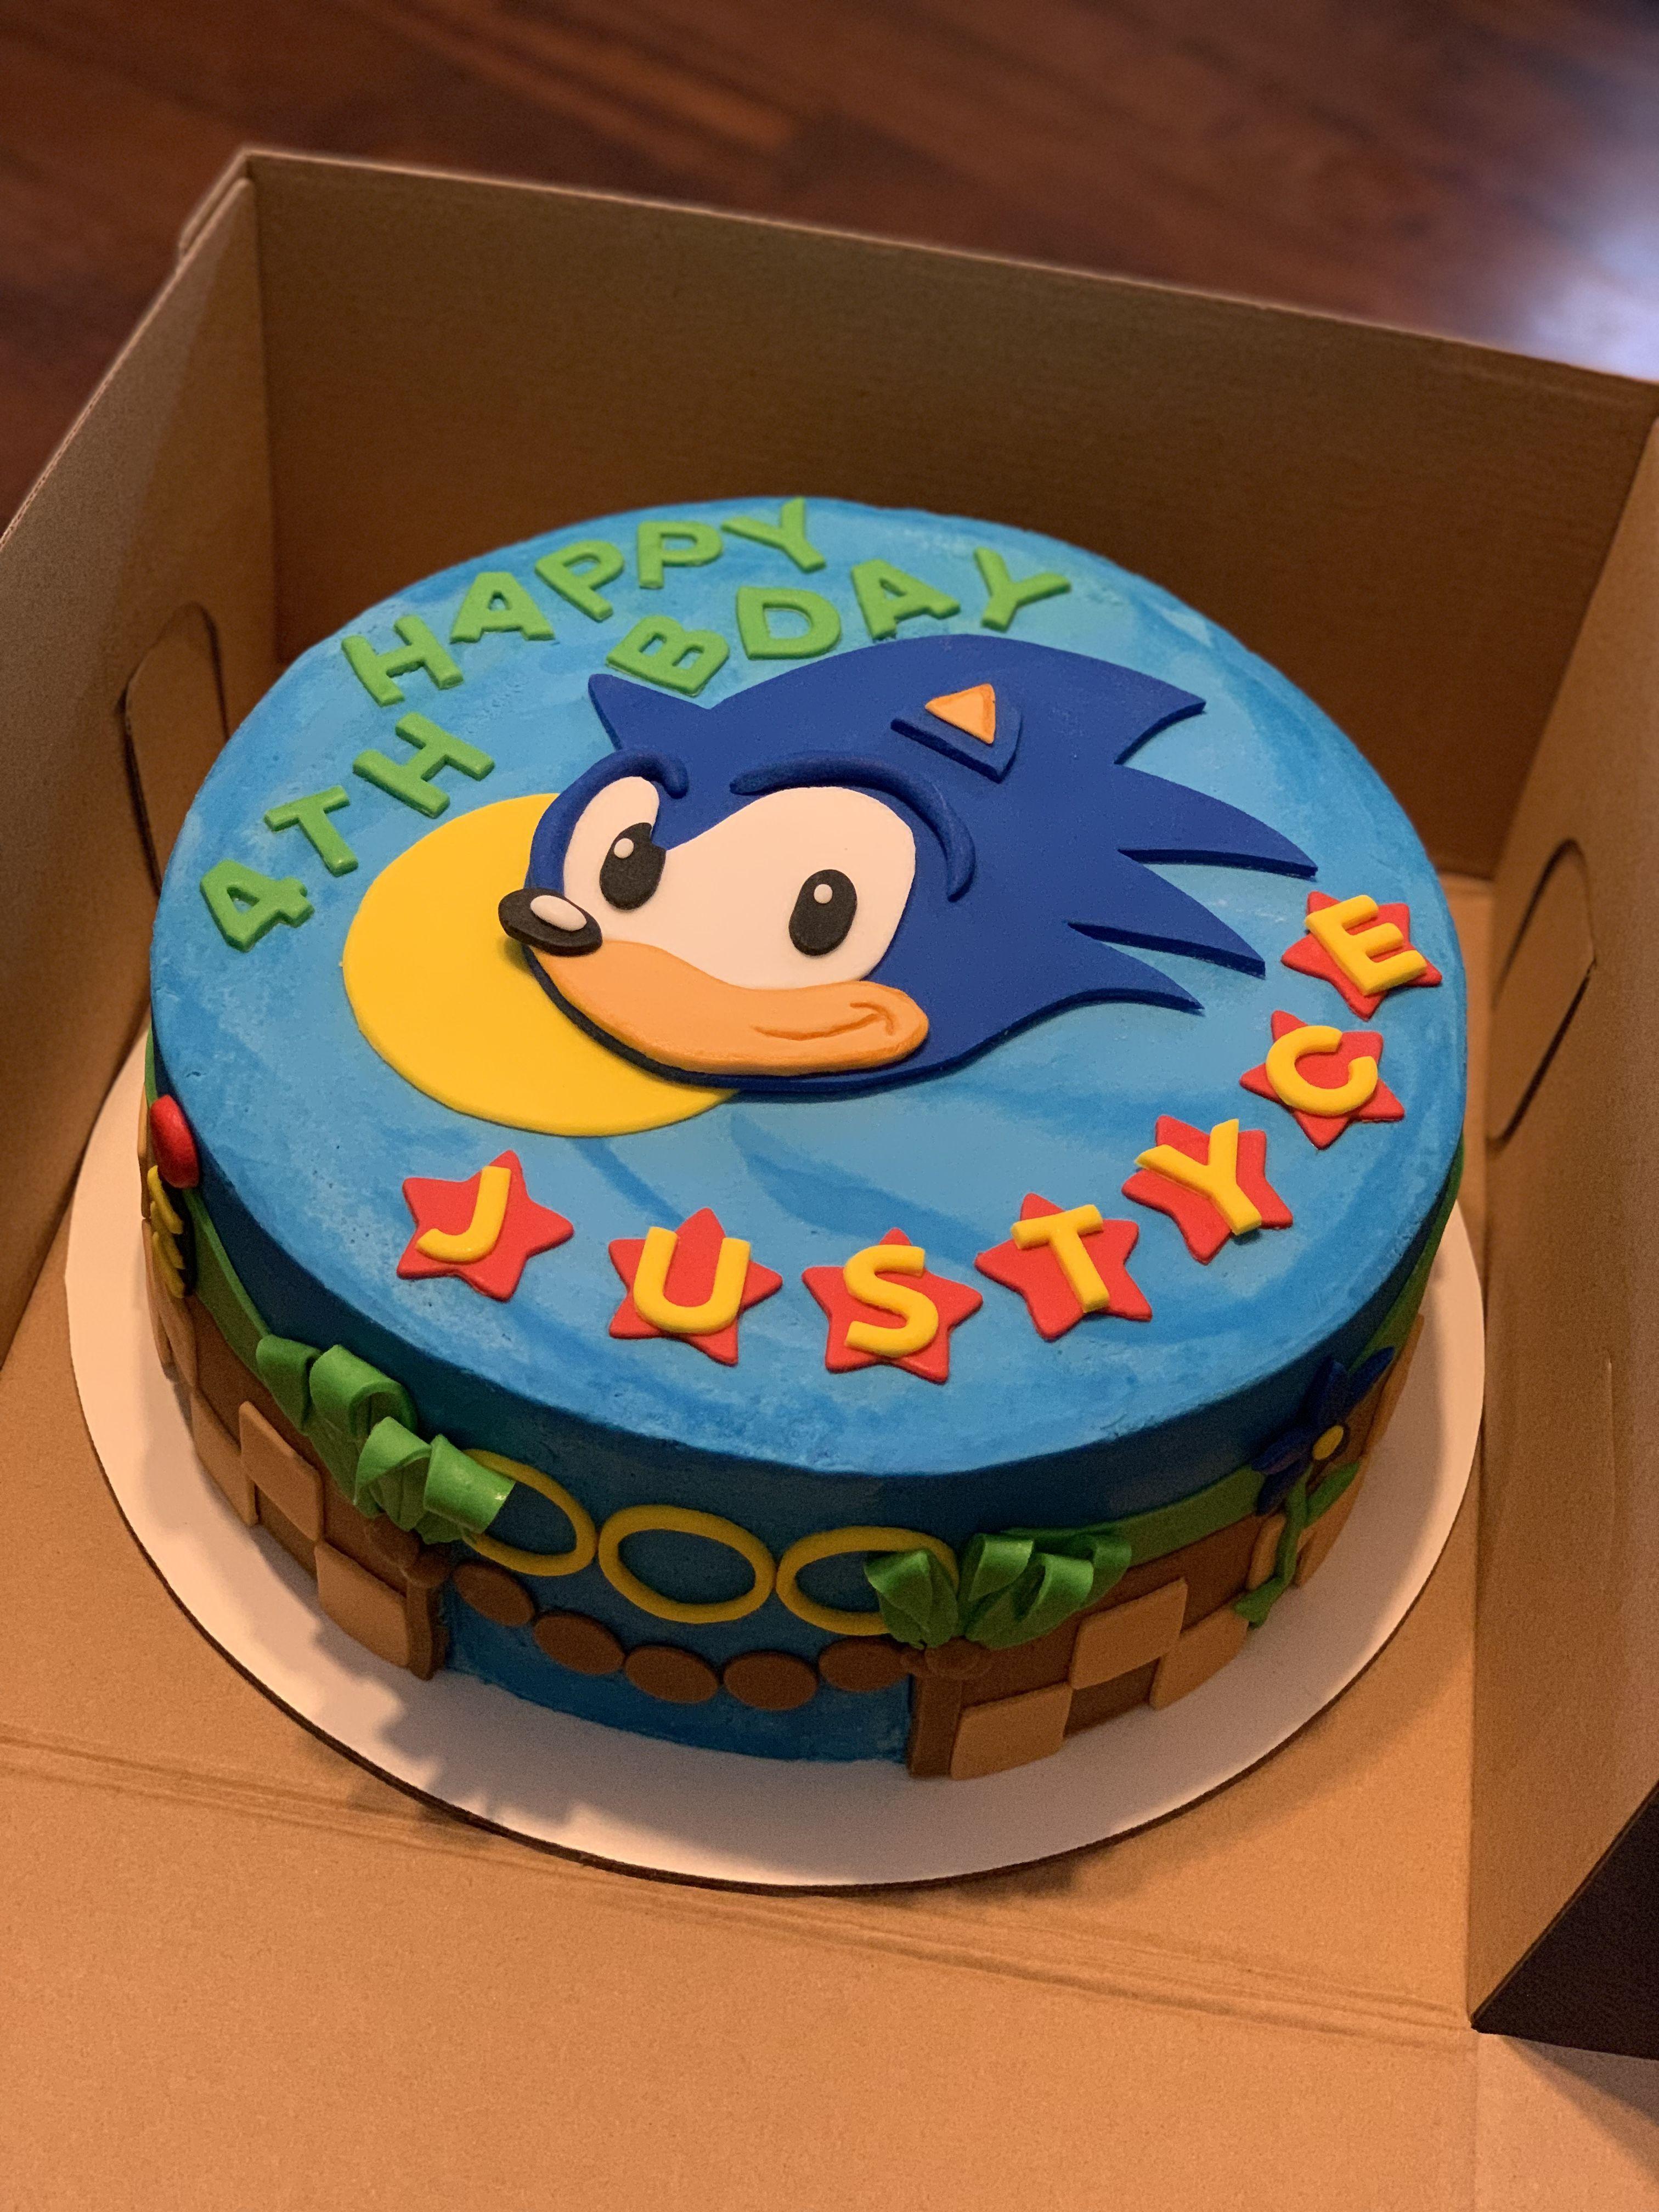 Sonic The Hedgehog Cake Hedgehogcake Sonic The Hedgehog Cake Hedgehogcake En 2020 Pastel De Sonic Fiestas De Cumpleanos De Sonic Fiesta De Sonic